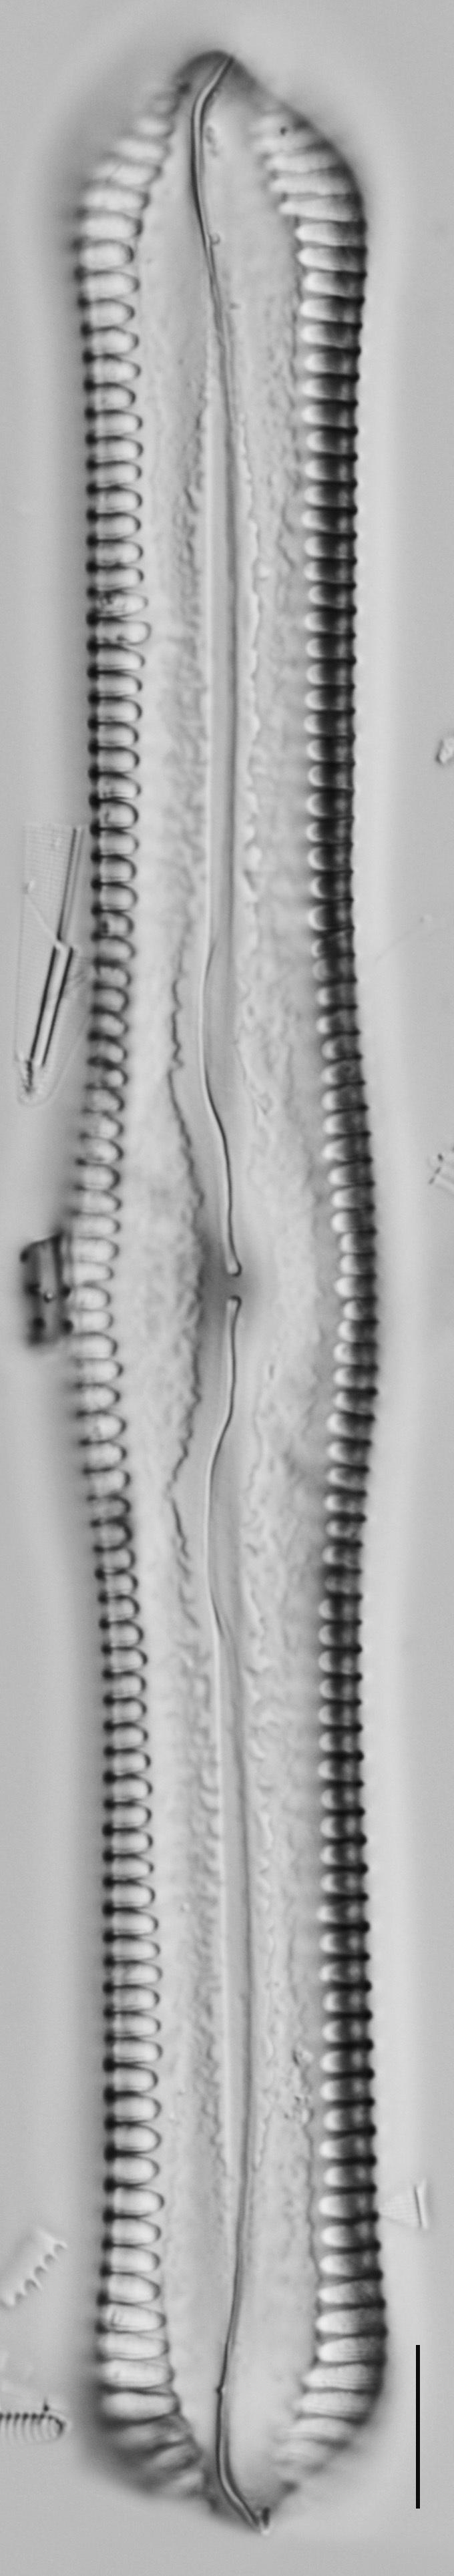 Pinnularia cuneicephala LM4